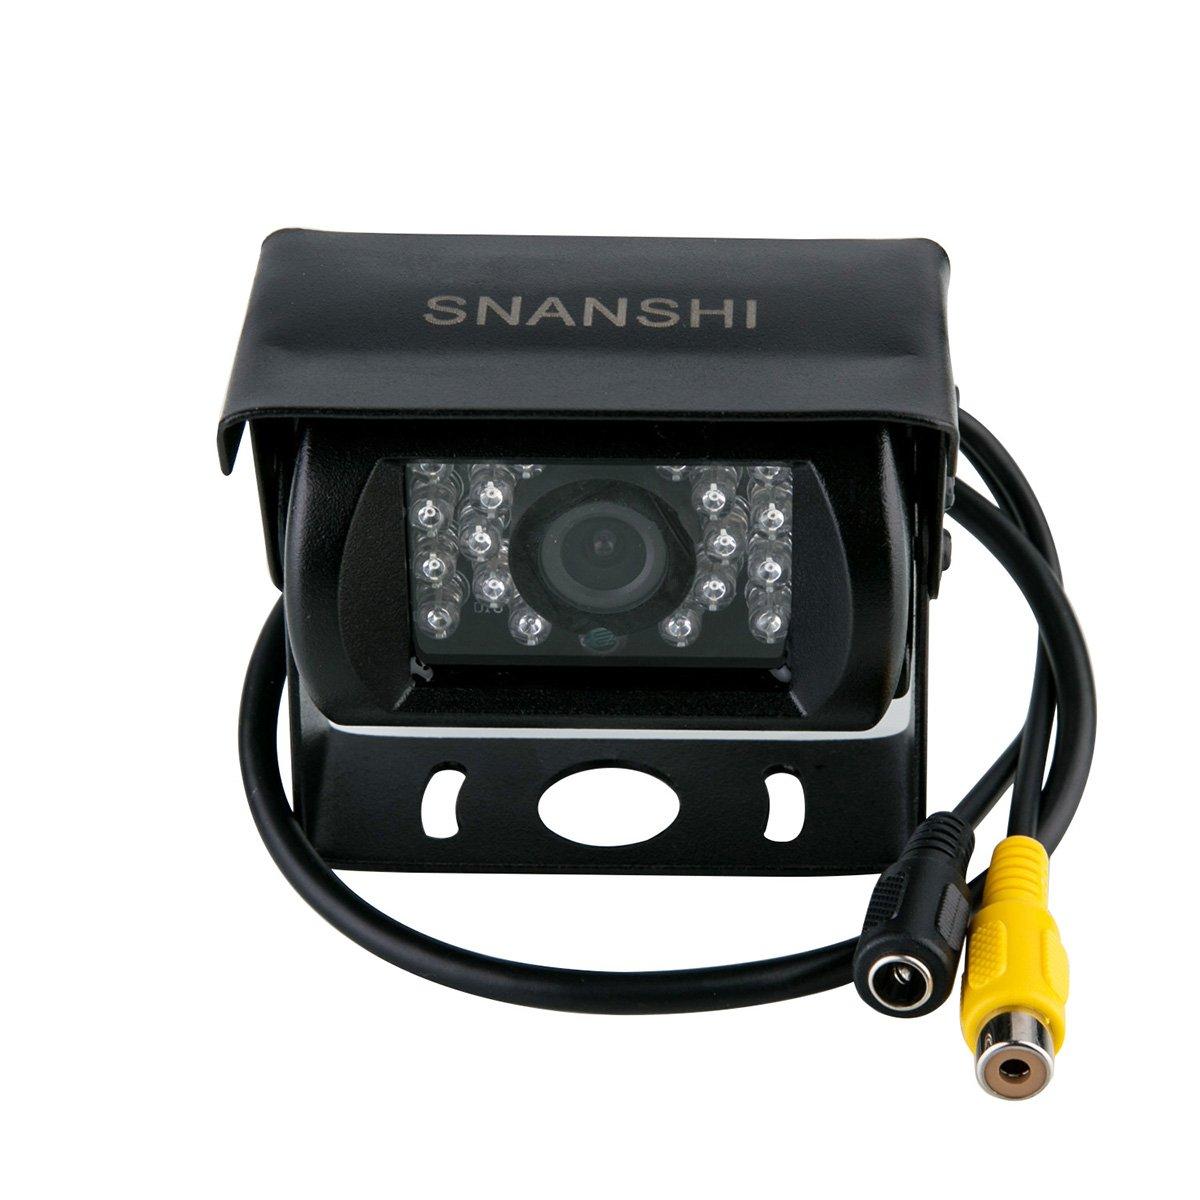 Camión coche retrovisor SXIESI autobús cámara CCD para el reexamen revocando aparcando Kit IR LED de visión nocturna impermeable